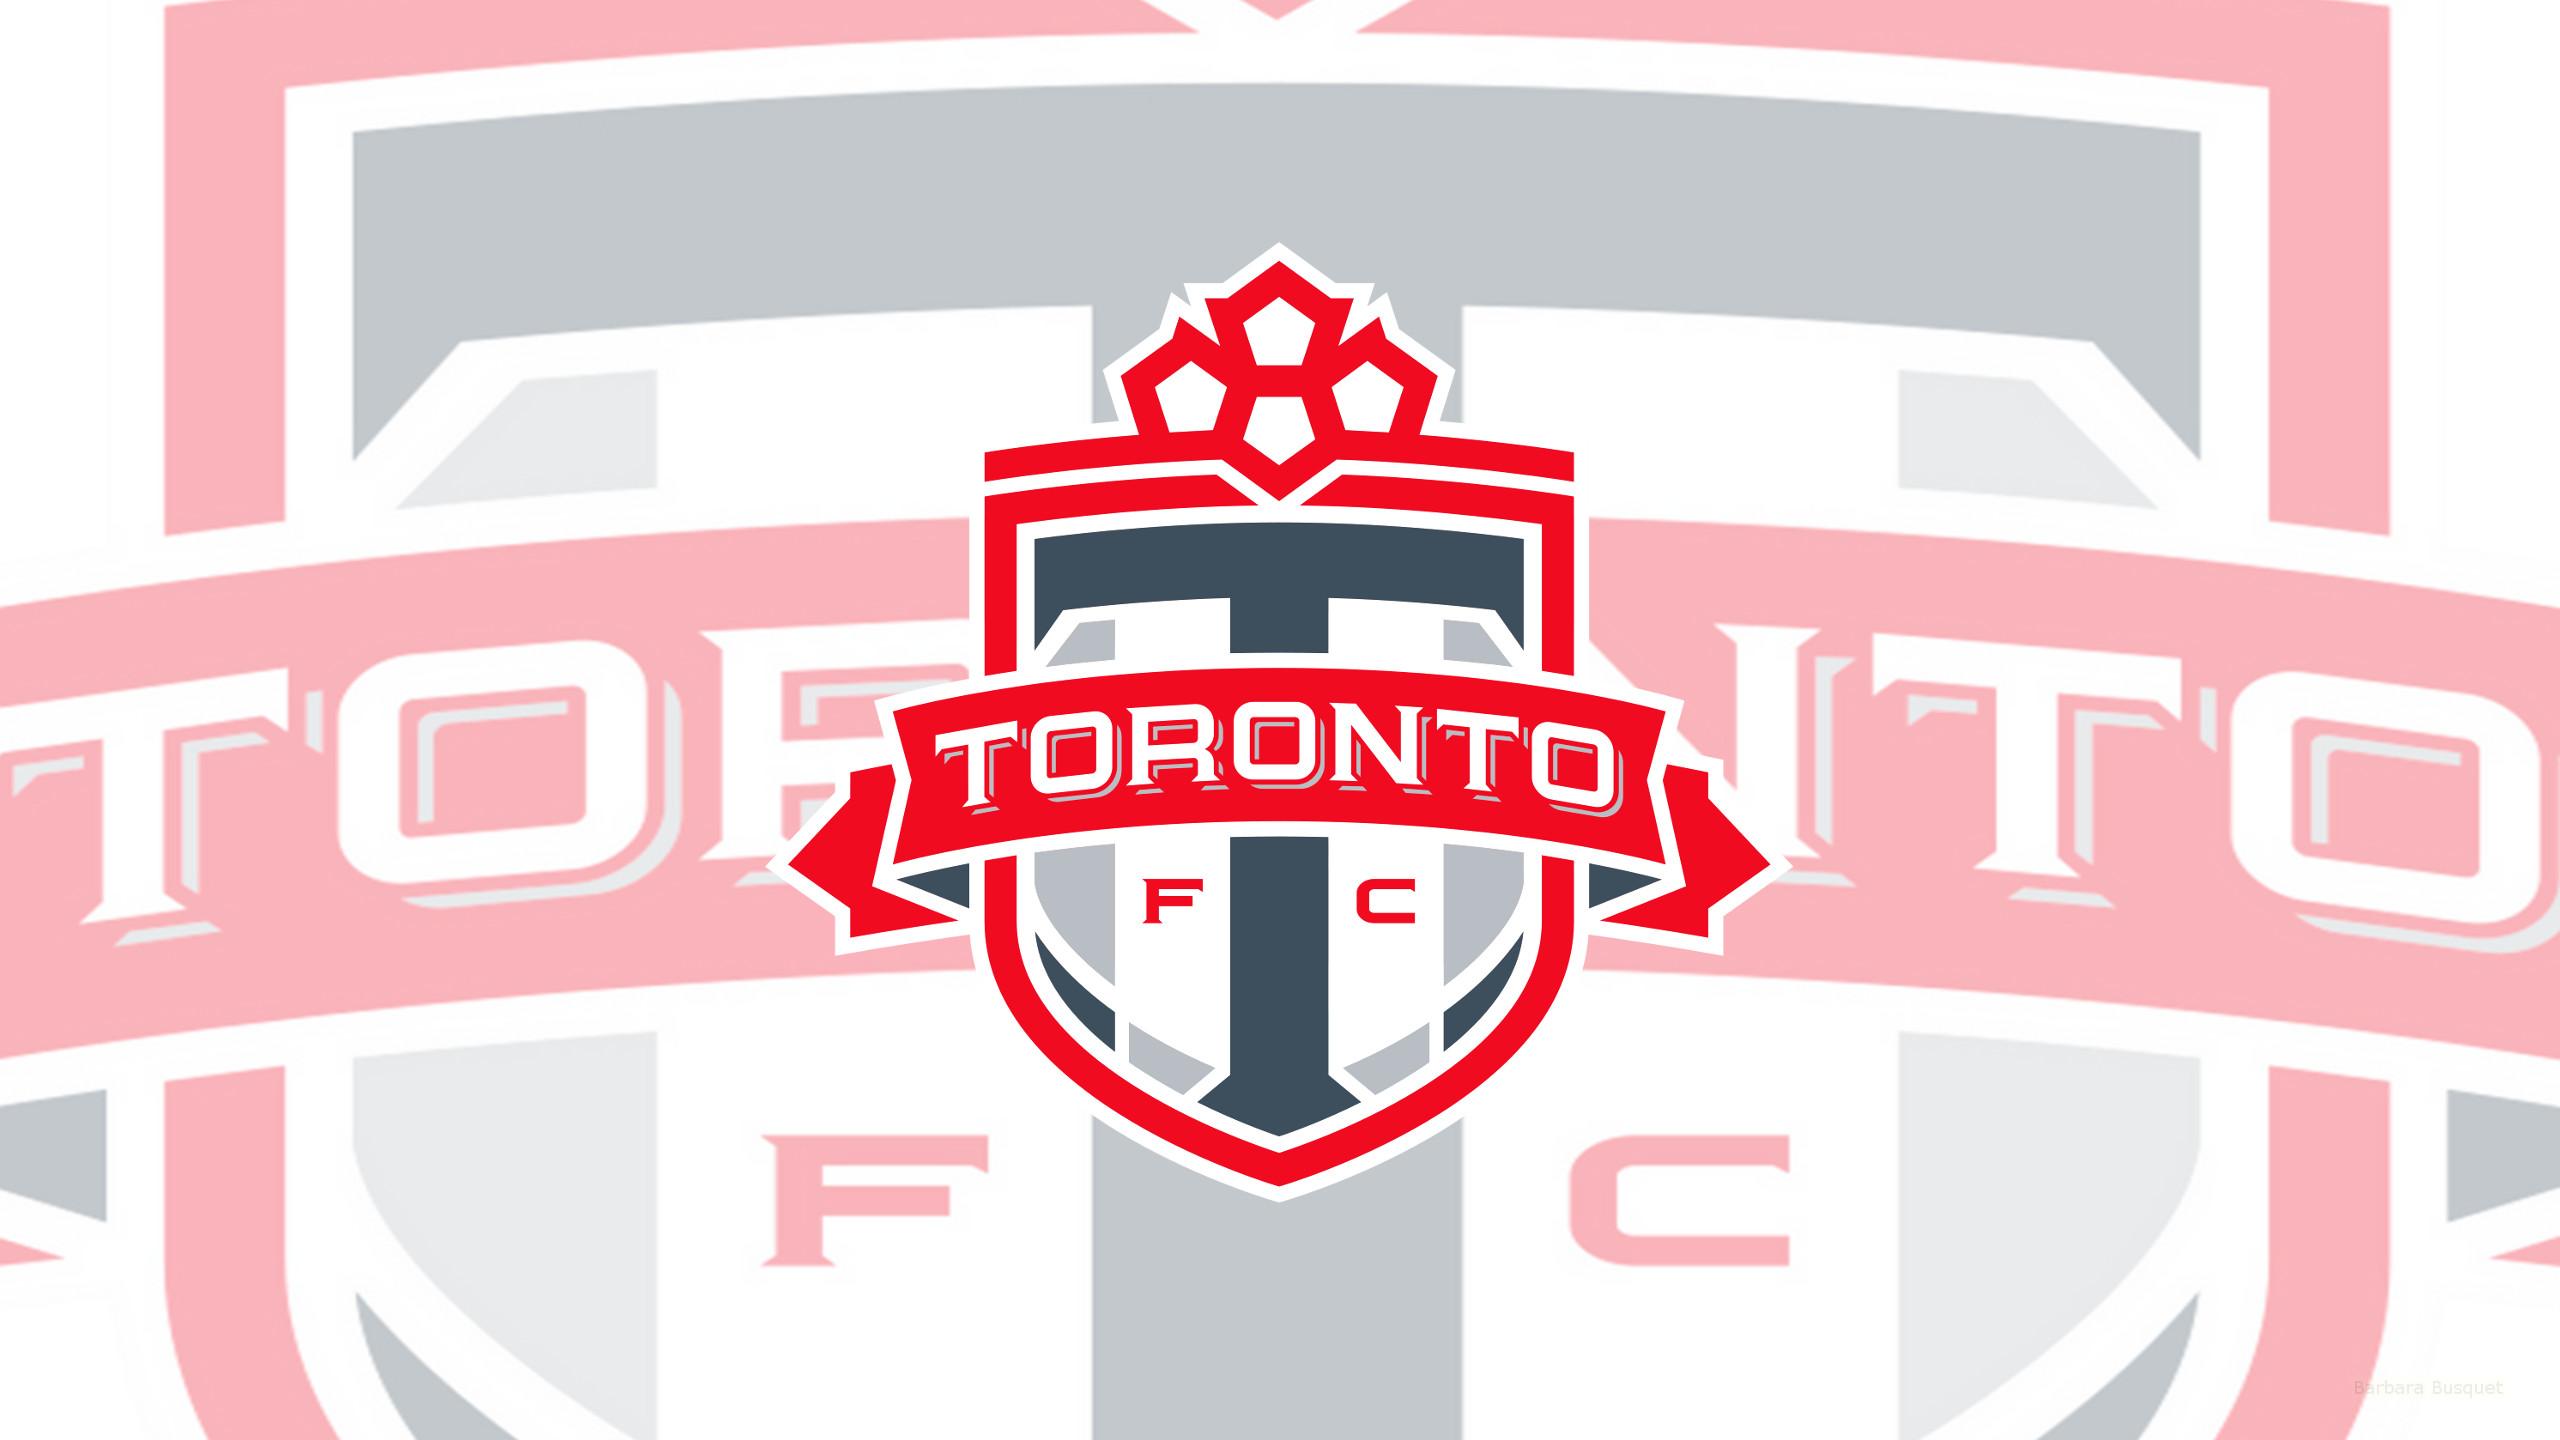 Toronto FC TFC logo wallpapers   Barbaras HD Wallpapers 2560x1440